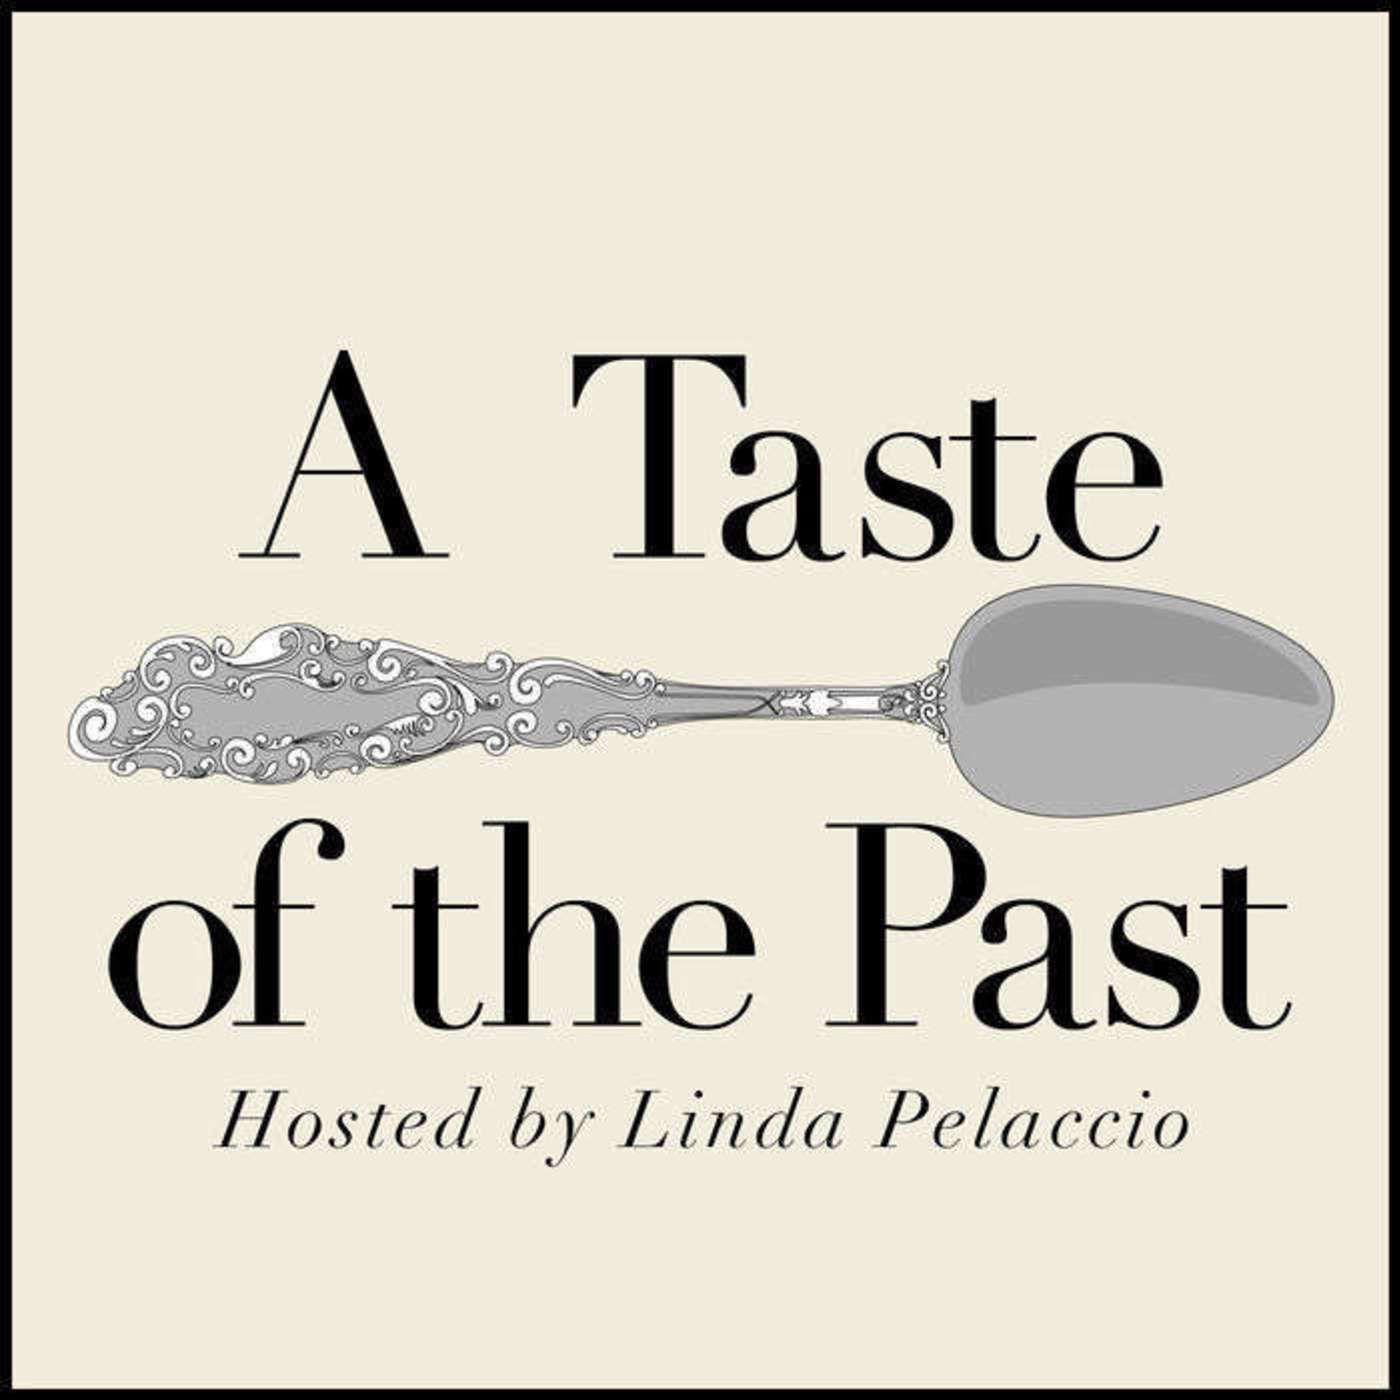 Episode 219: Libyan Jewish Cuisine in Rome